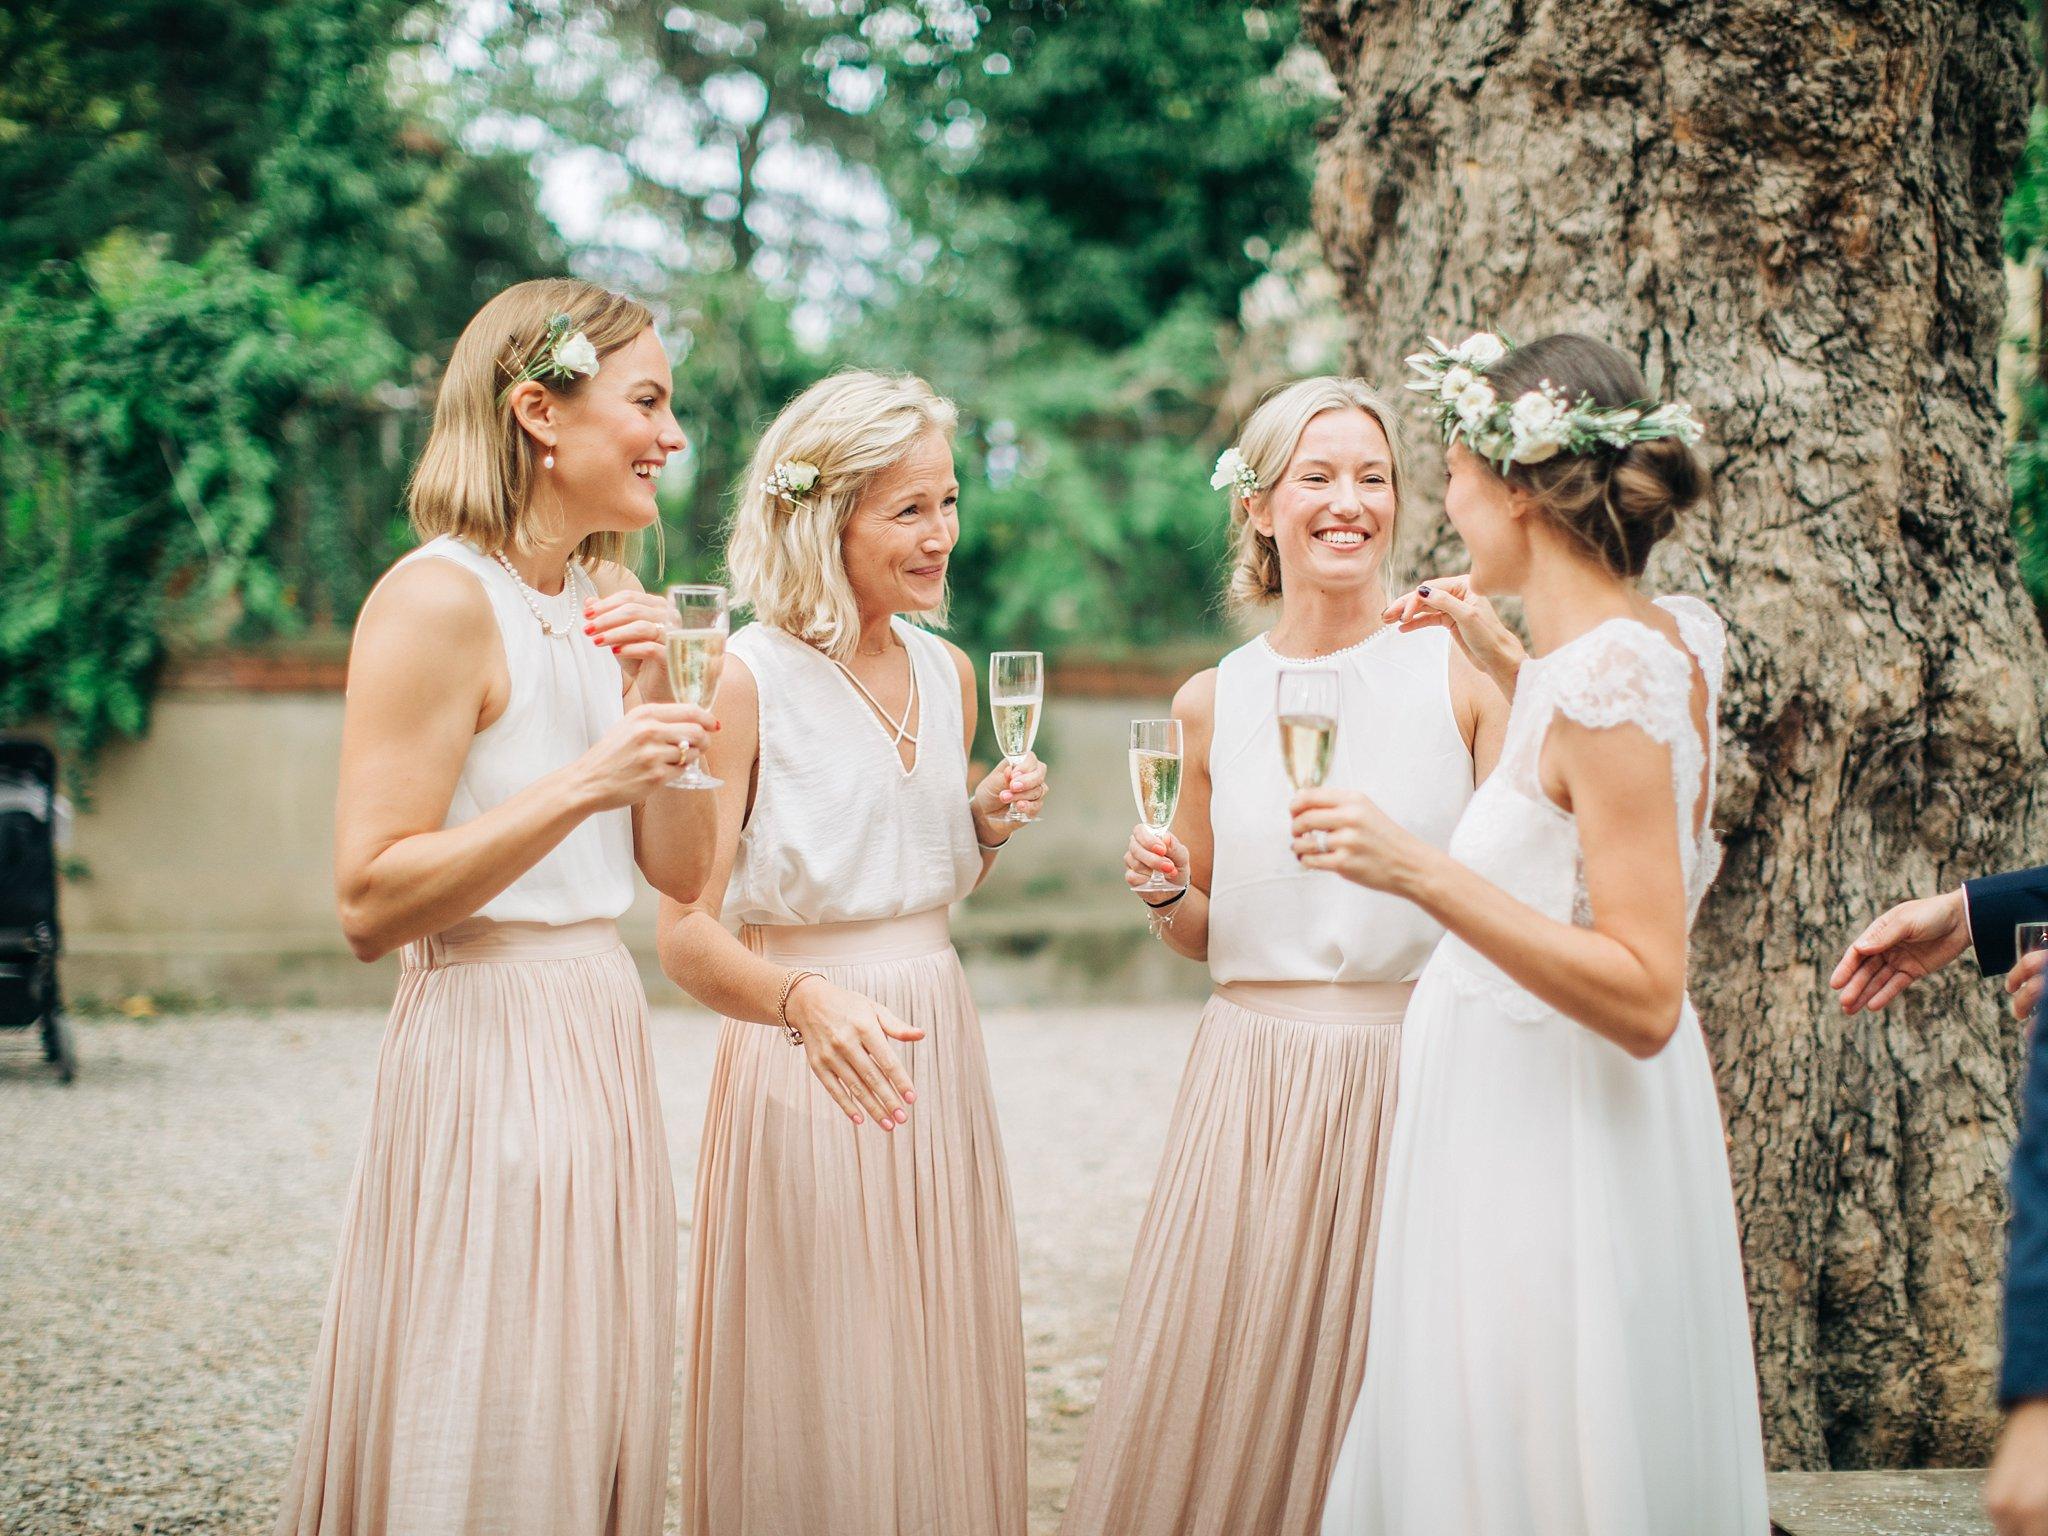 Wedding Photographer Perpignan - Château Las Collas Wedding - Hugo Hennequin048.jpg